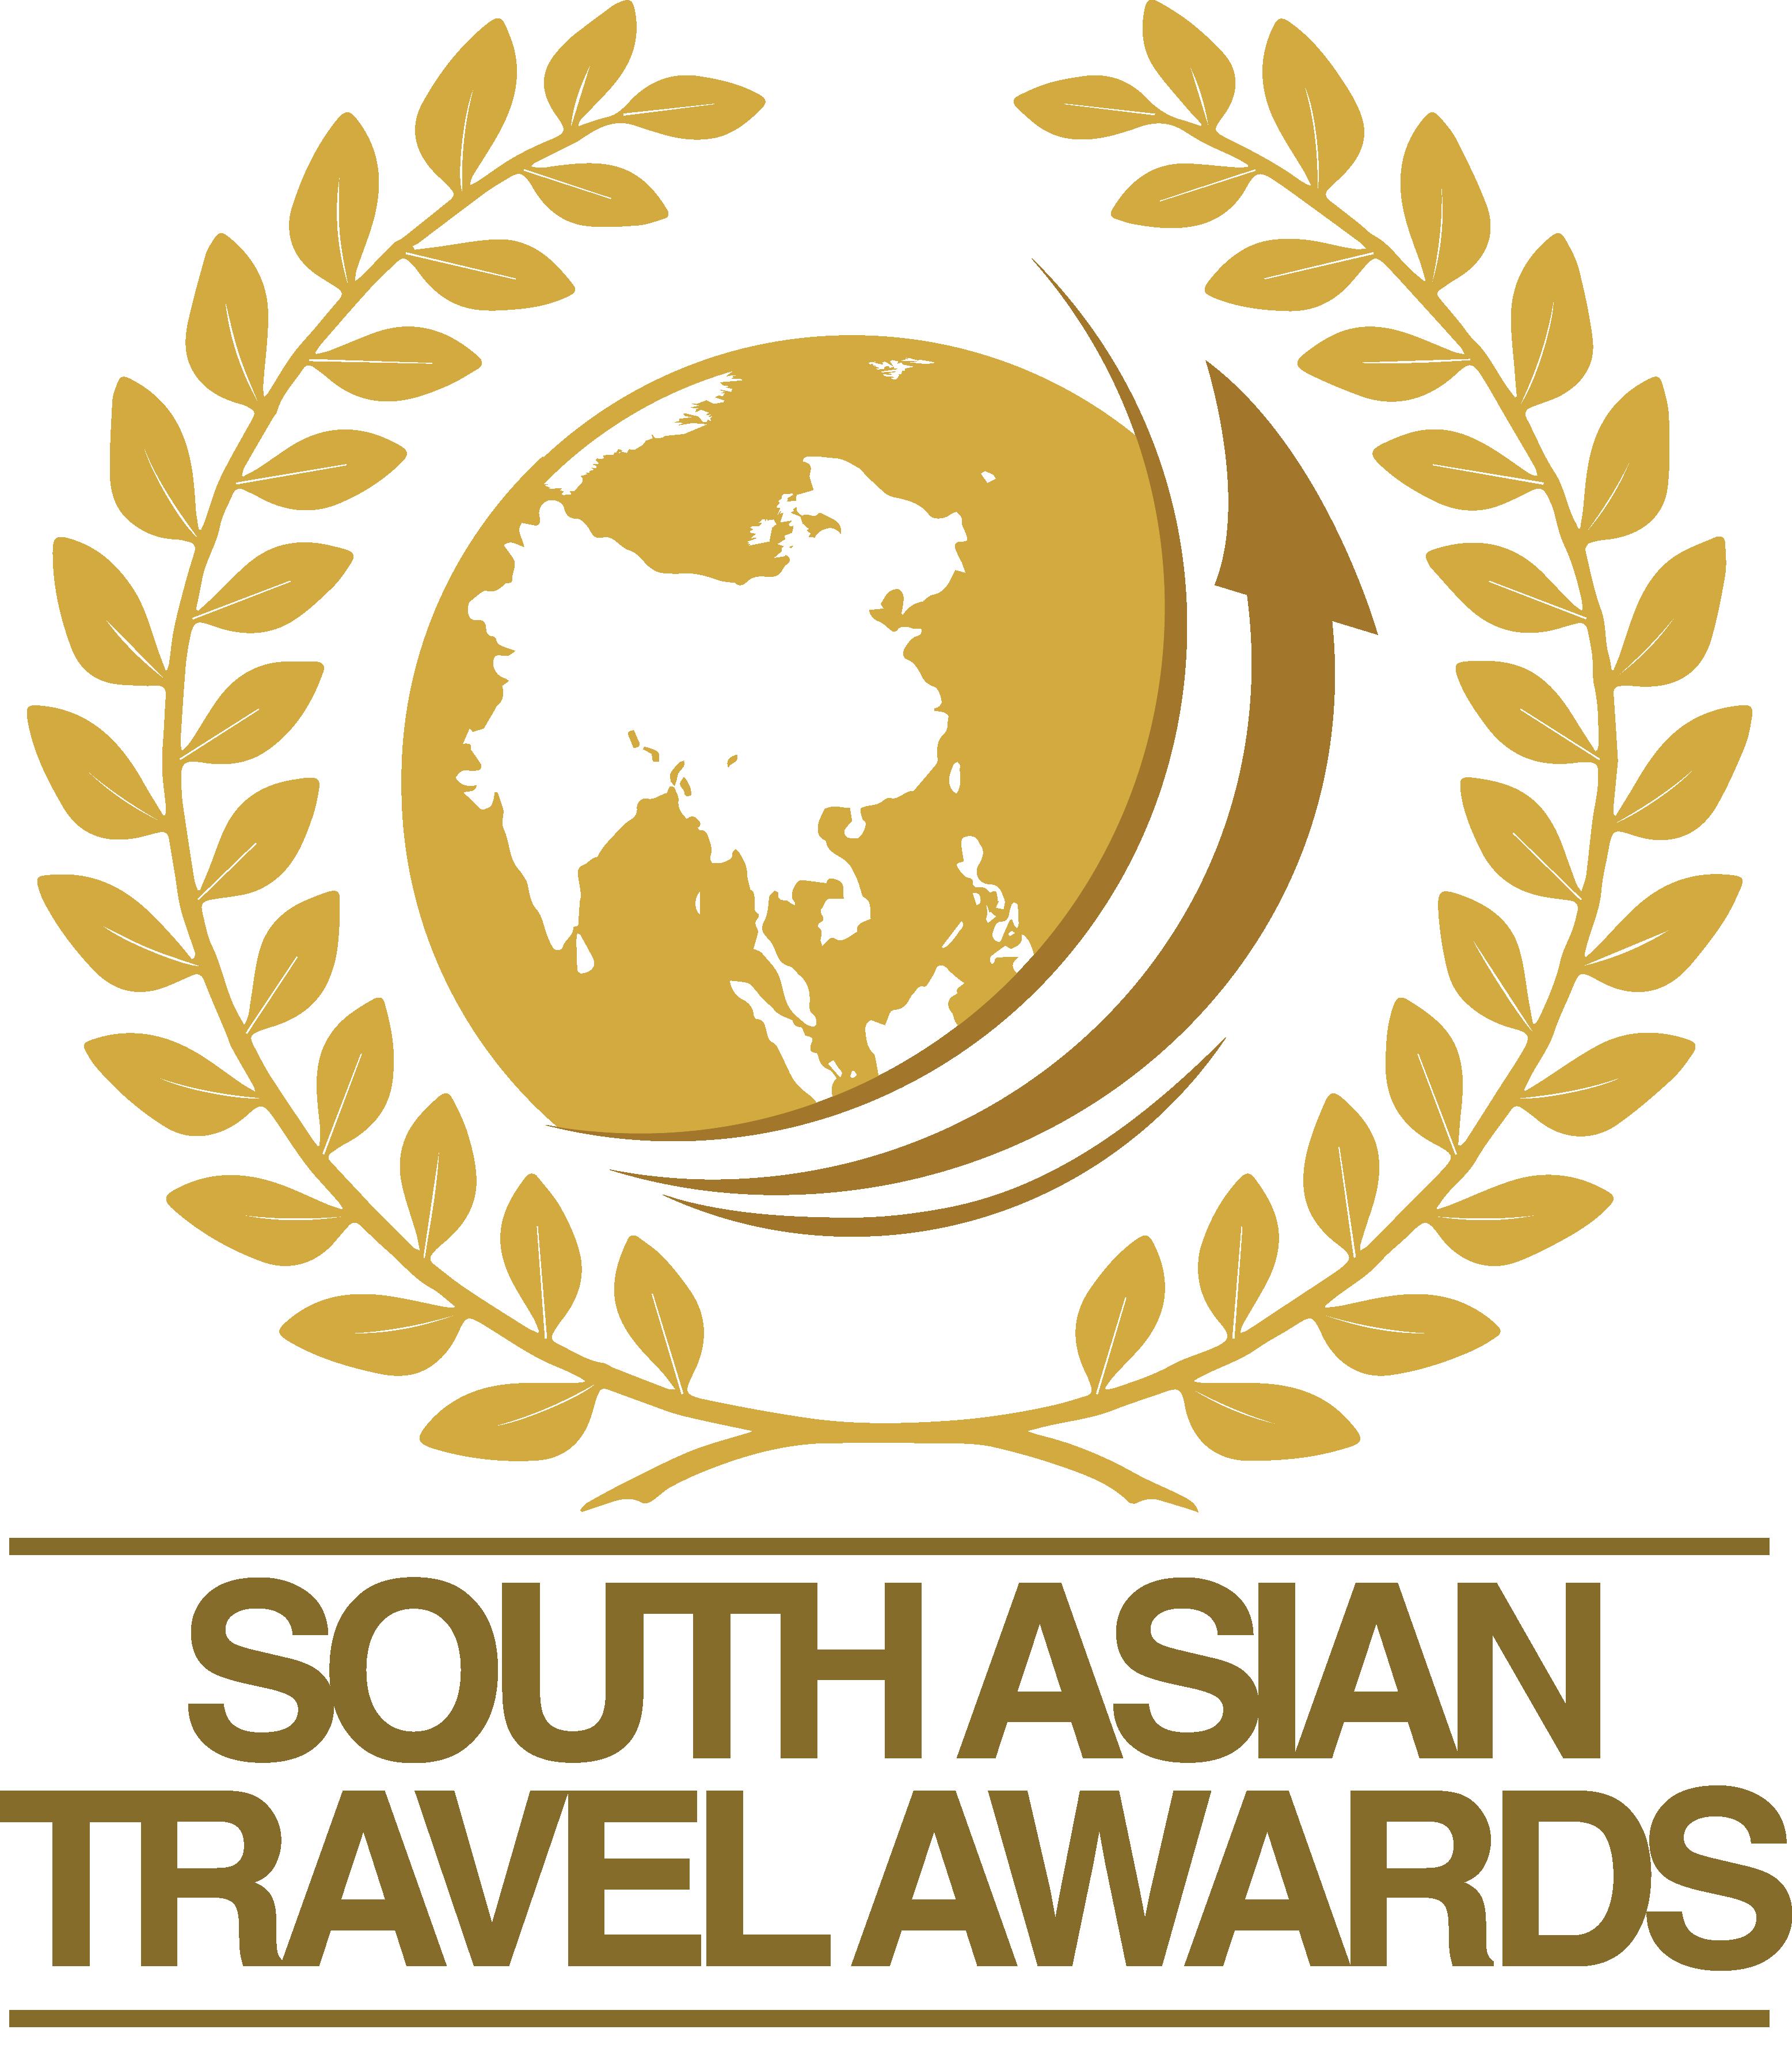 Fern clipart service award. South asian travel awards